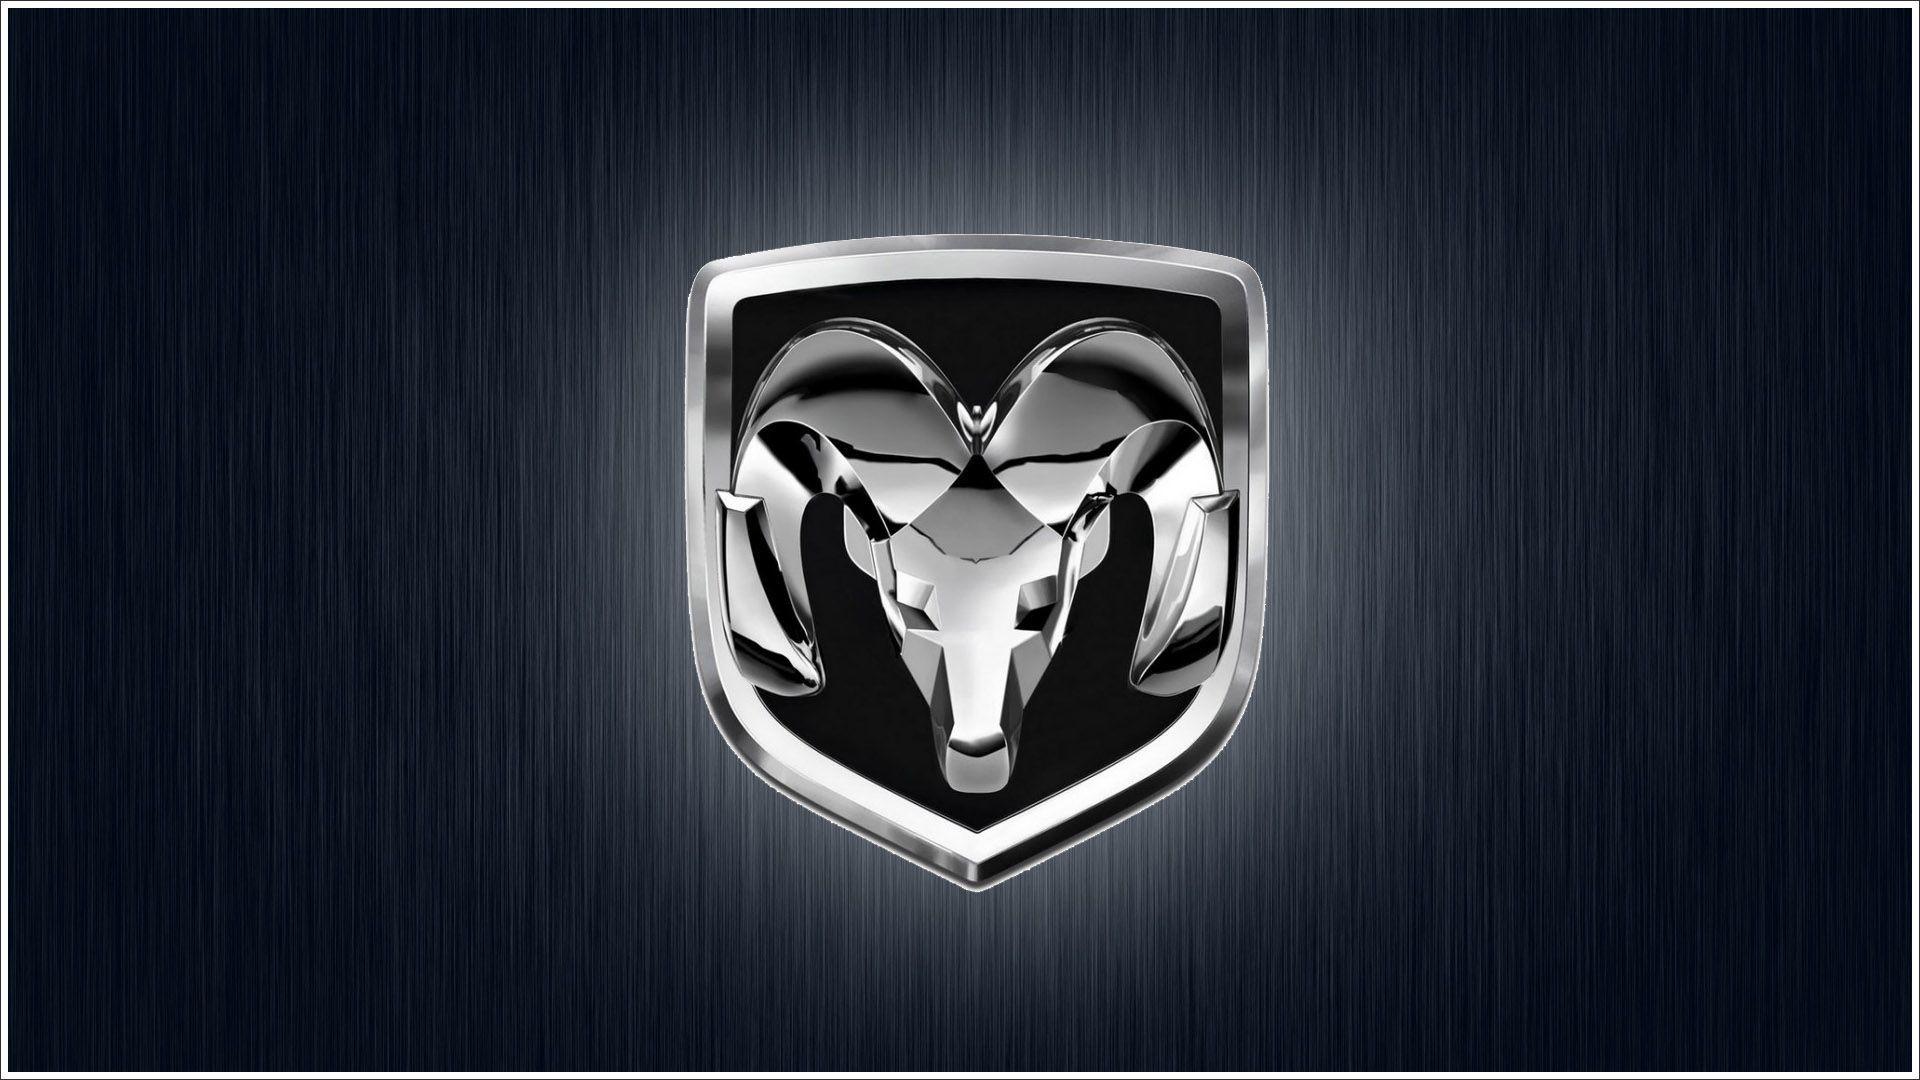 … Dodge Ram Wallpaper Hd. Download